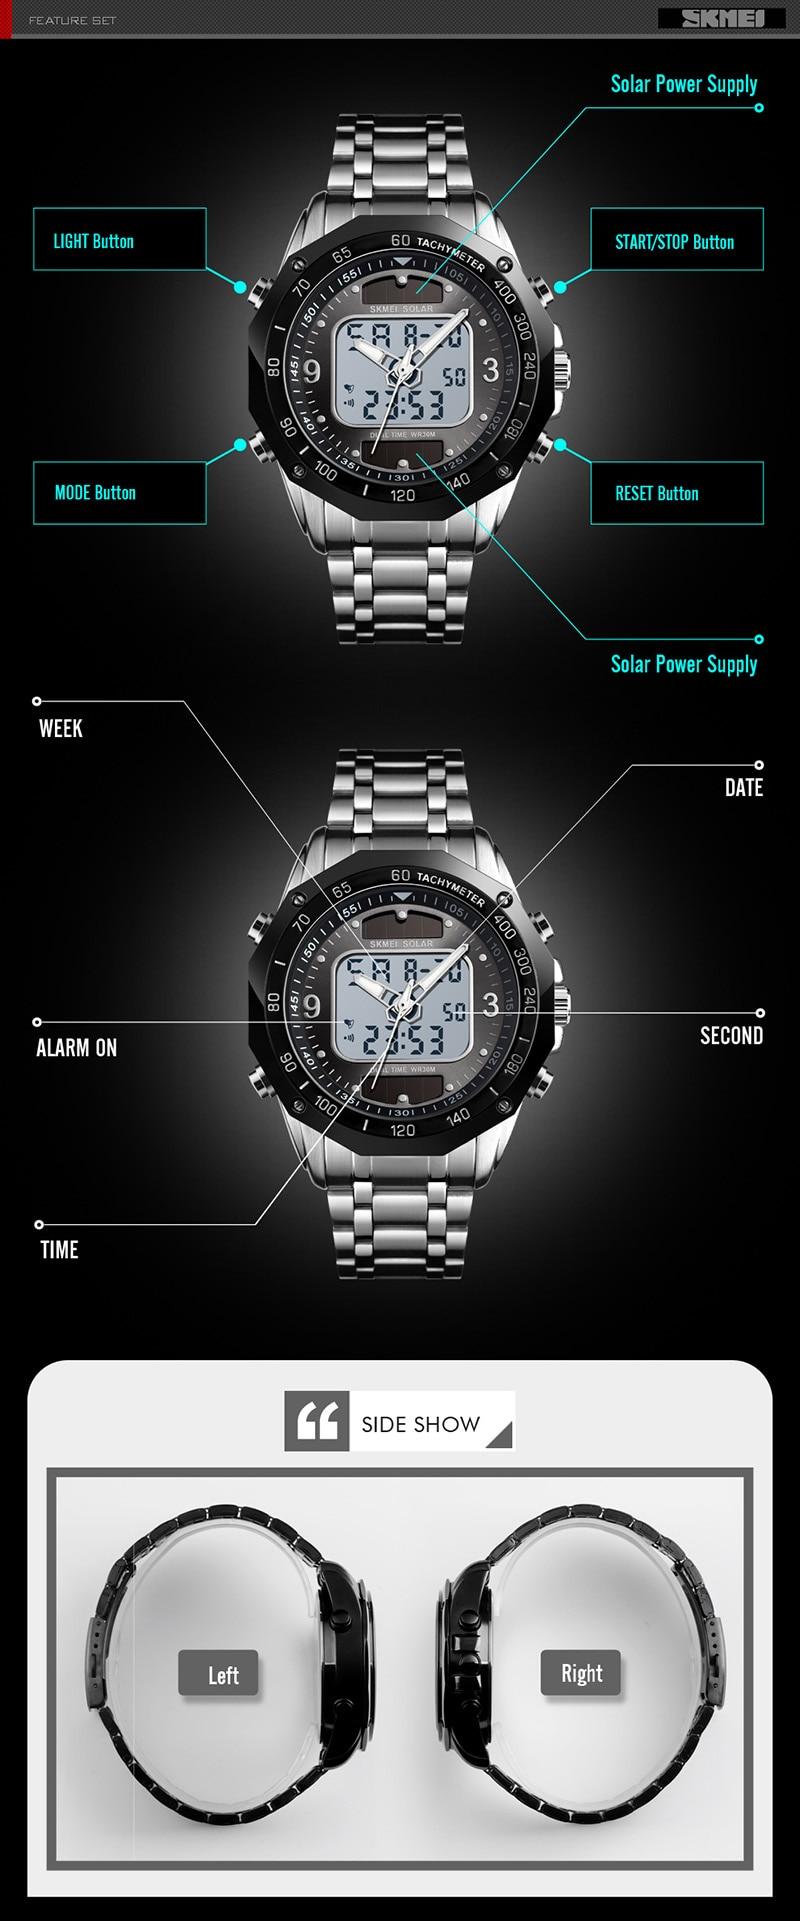 HTB1Qfd8UHPpK1RjSZFFq6y5PpXaT Solar Men Military Sport Watches Men's Digital Quartz Clock Full Steel Waterproof Wrist Watch relojes hombre 2019 SKMEI